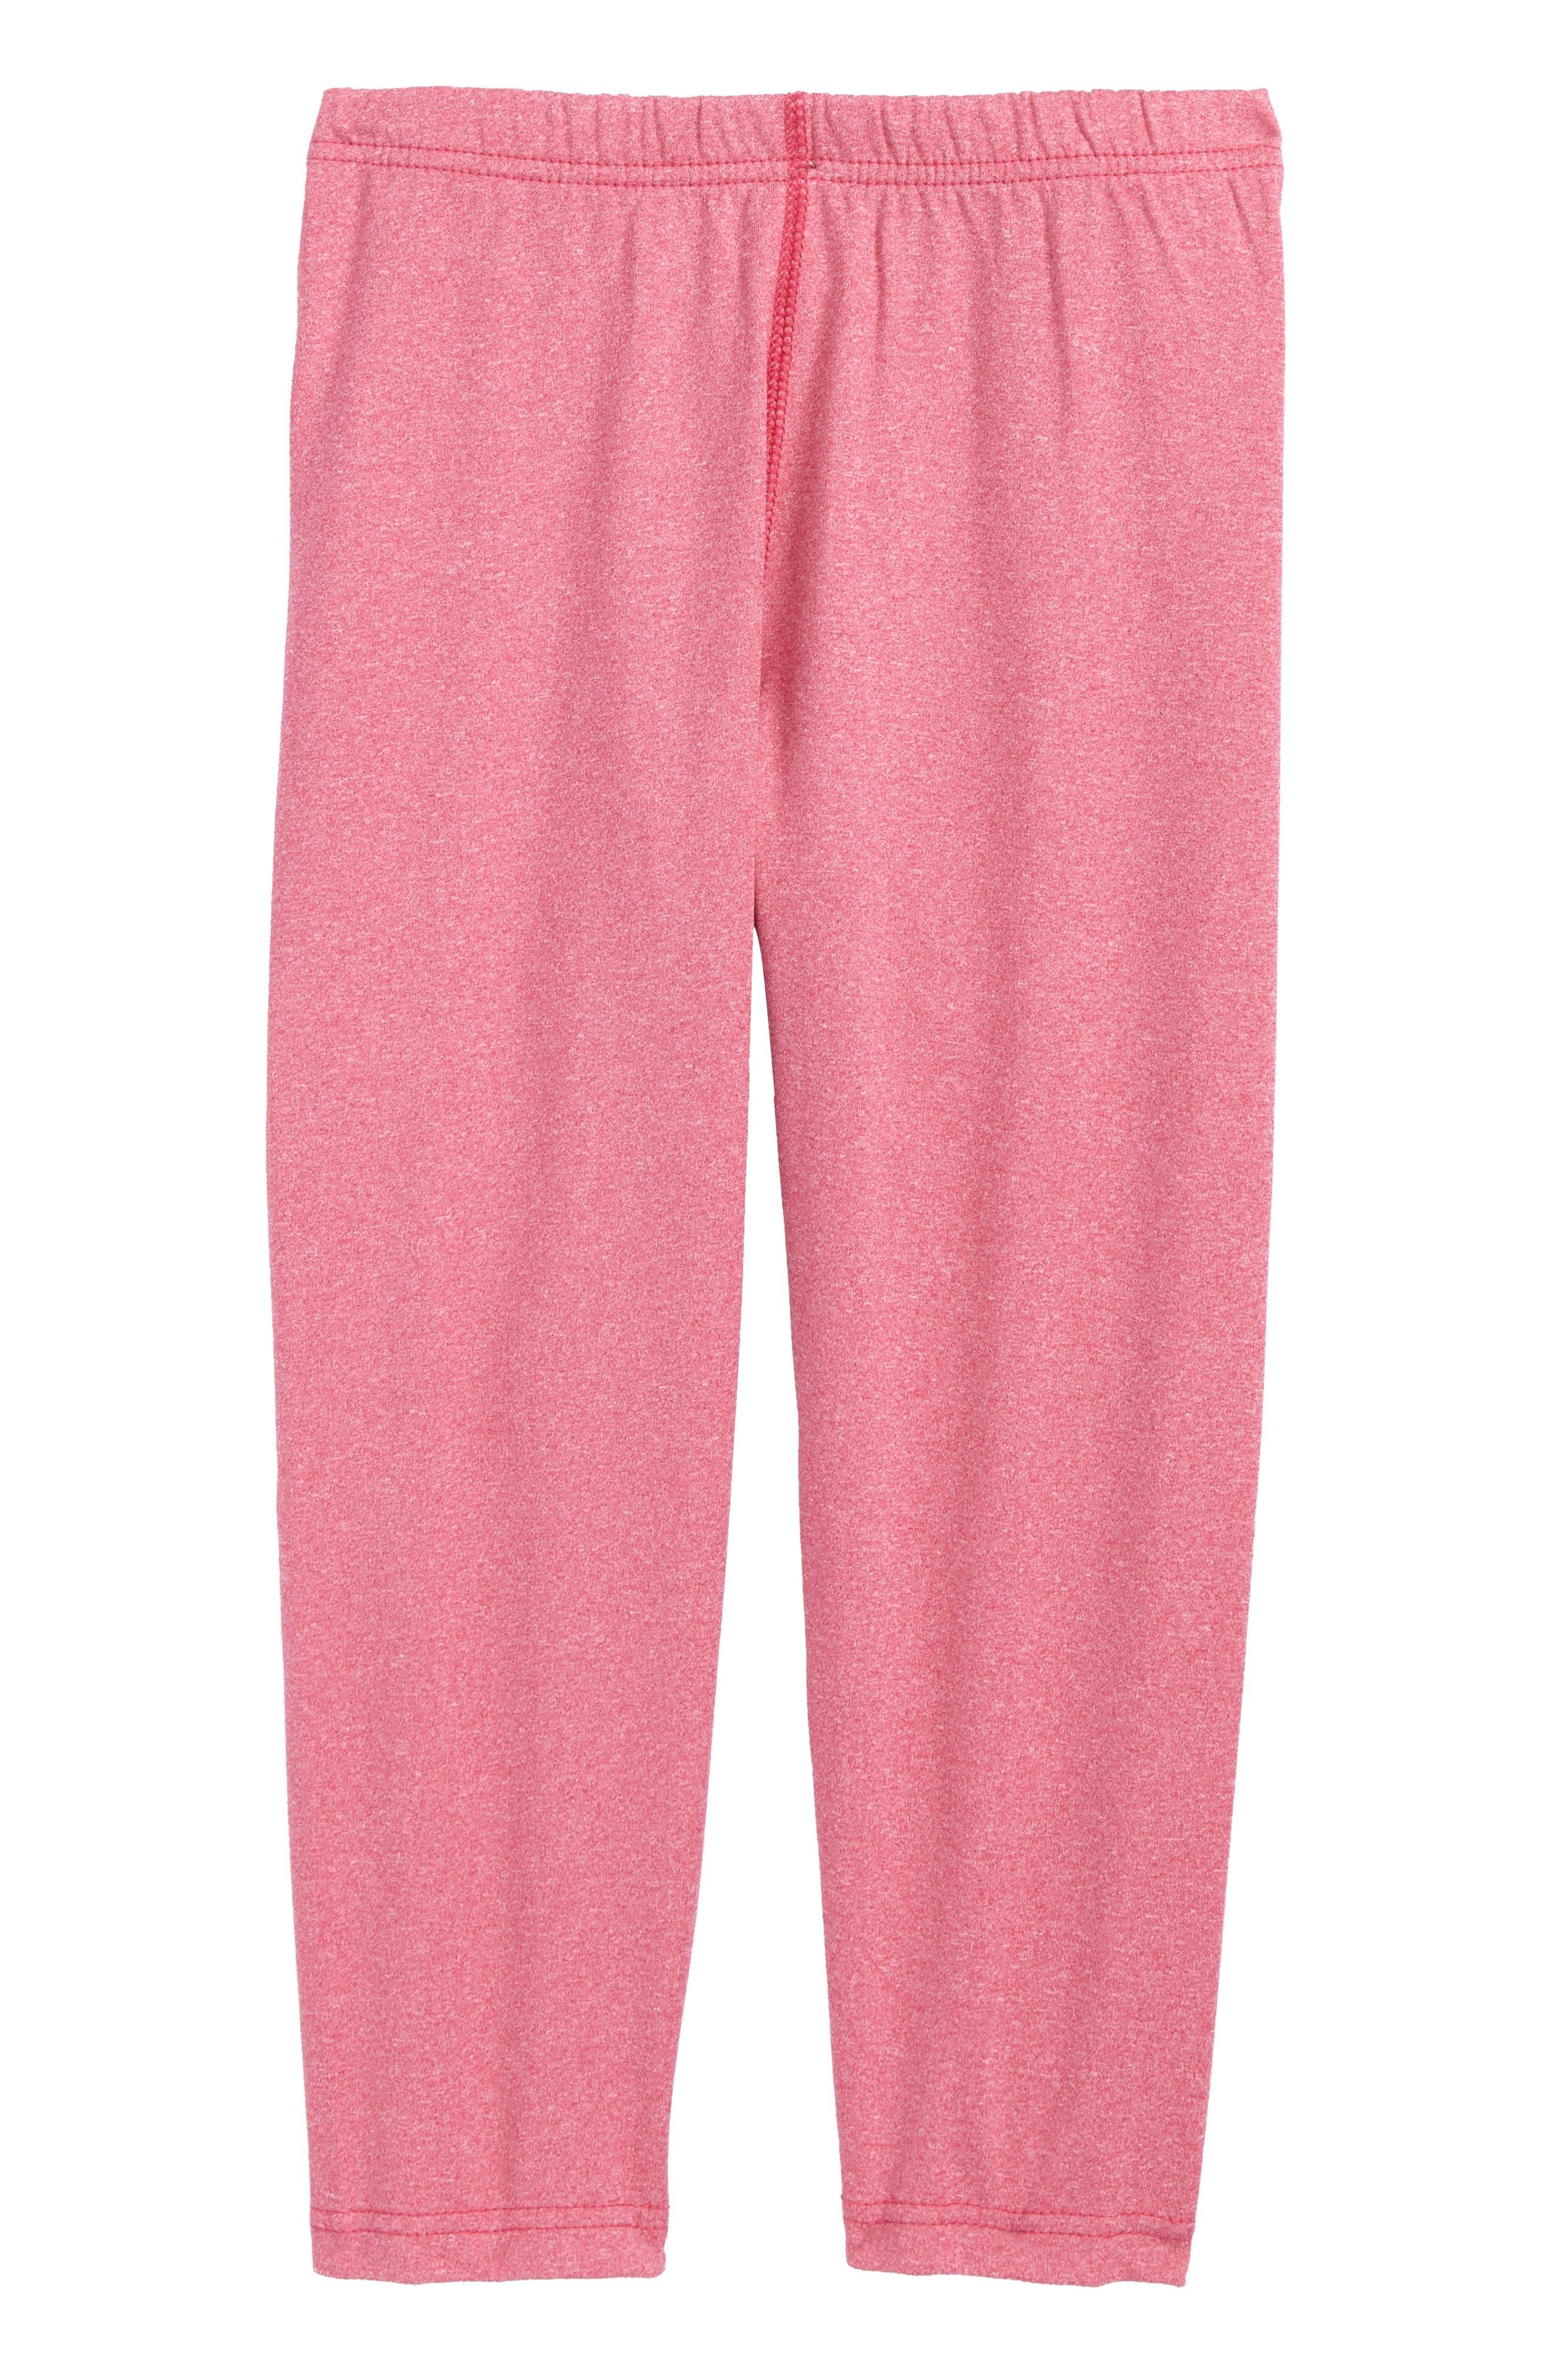 'Micro D<sup>®</sup>' Fleece Pants,                             Main thumbnail 1, color,                             Craft Pink